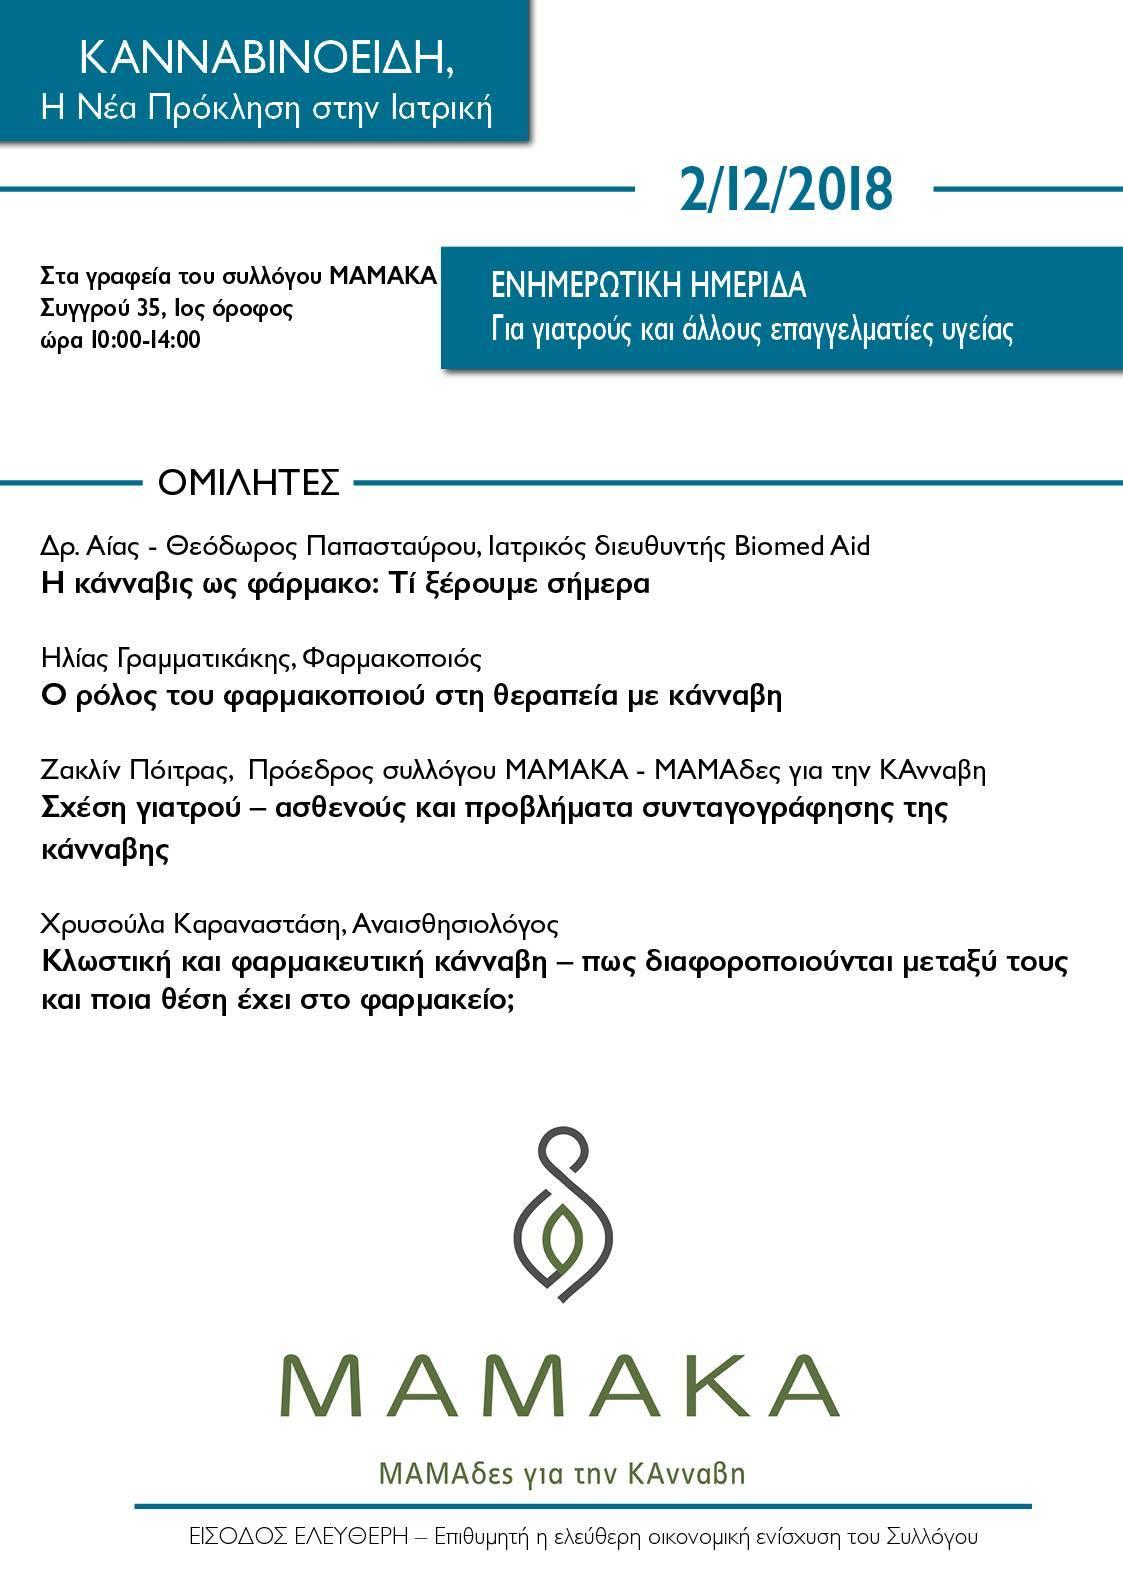 Read more about the article ΚΑΝΝΑΒΙΝΟΕΙΔΗ – Η νέα πρόκληση στην ιατρική